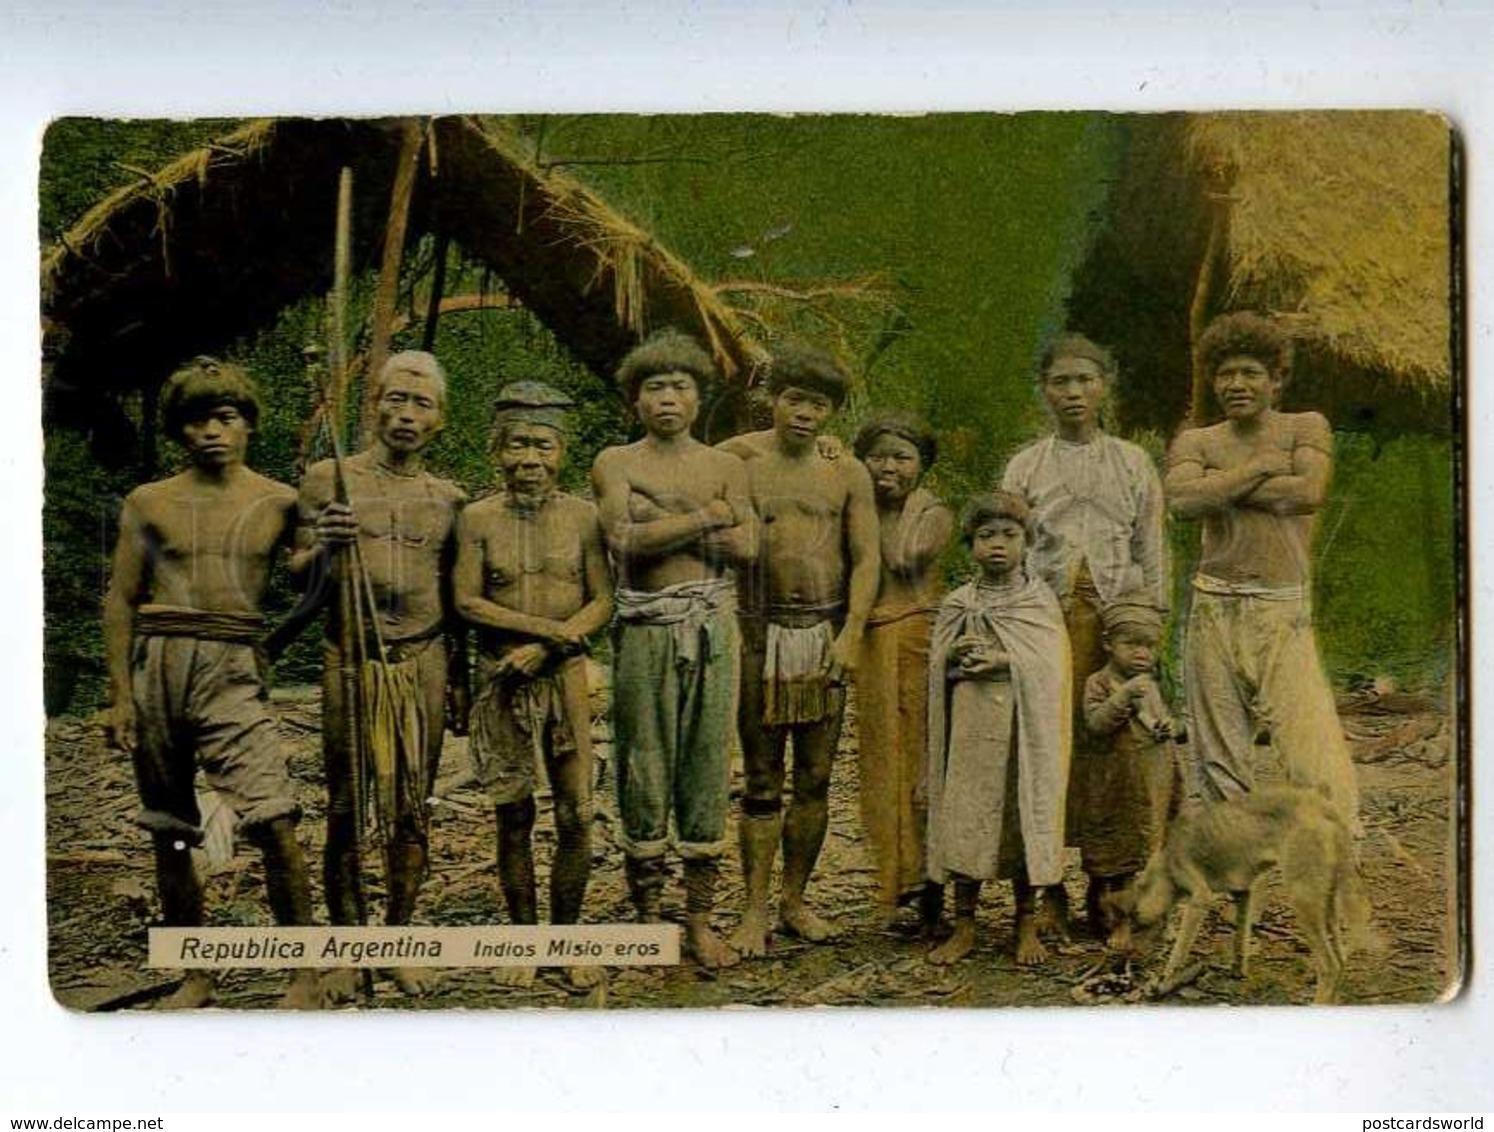 206606 ARGENTINA Indian Missionaries Vintage Photo Postcard - America